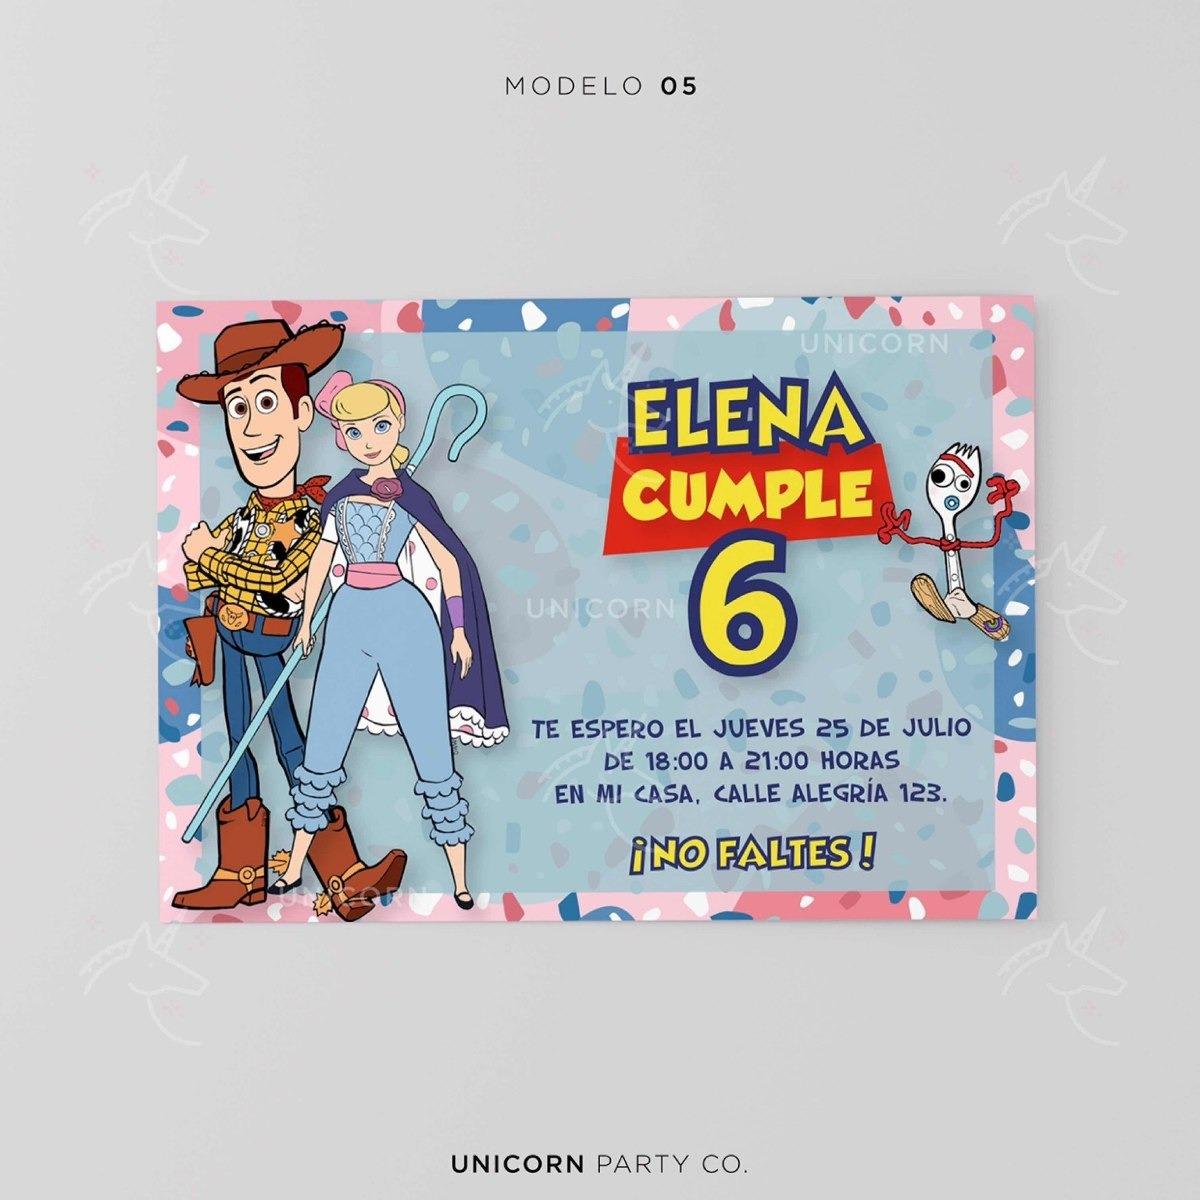 Invitación Digital Toy Story 4 Fiesta Forky Woody Cumpleaños